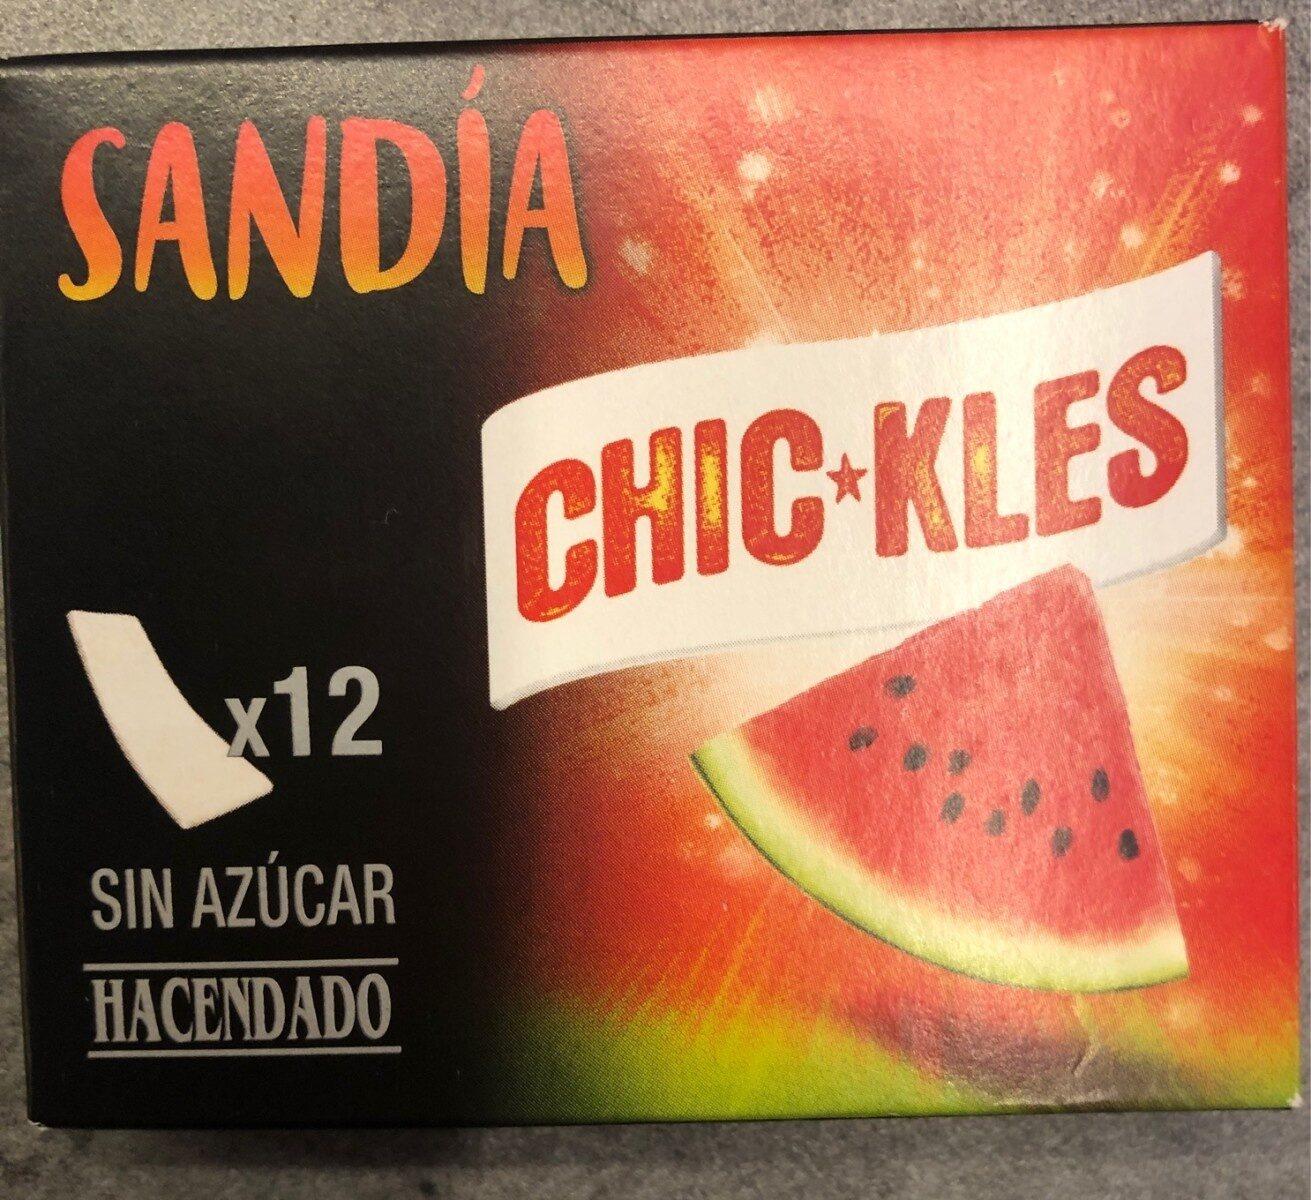 Sandia chic*kles - Produkt - es